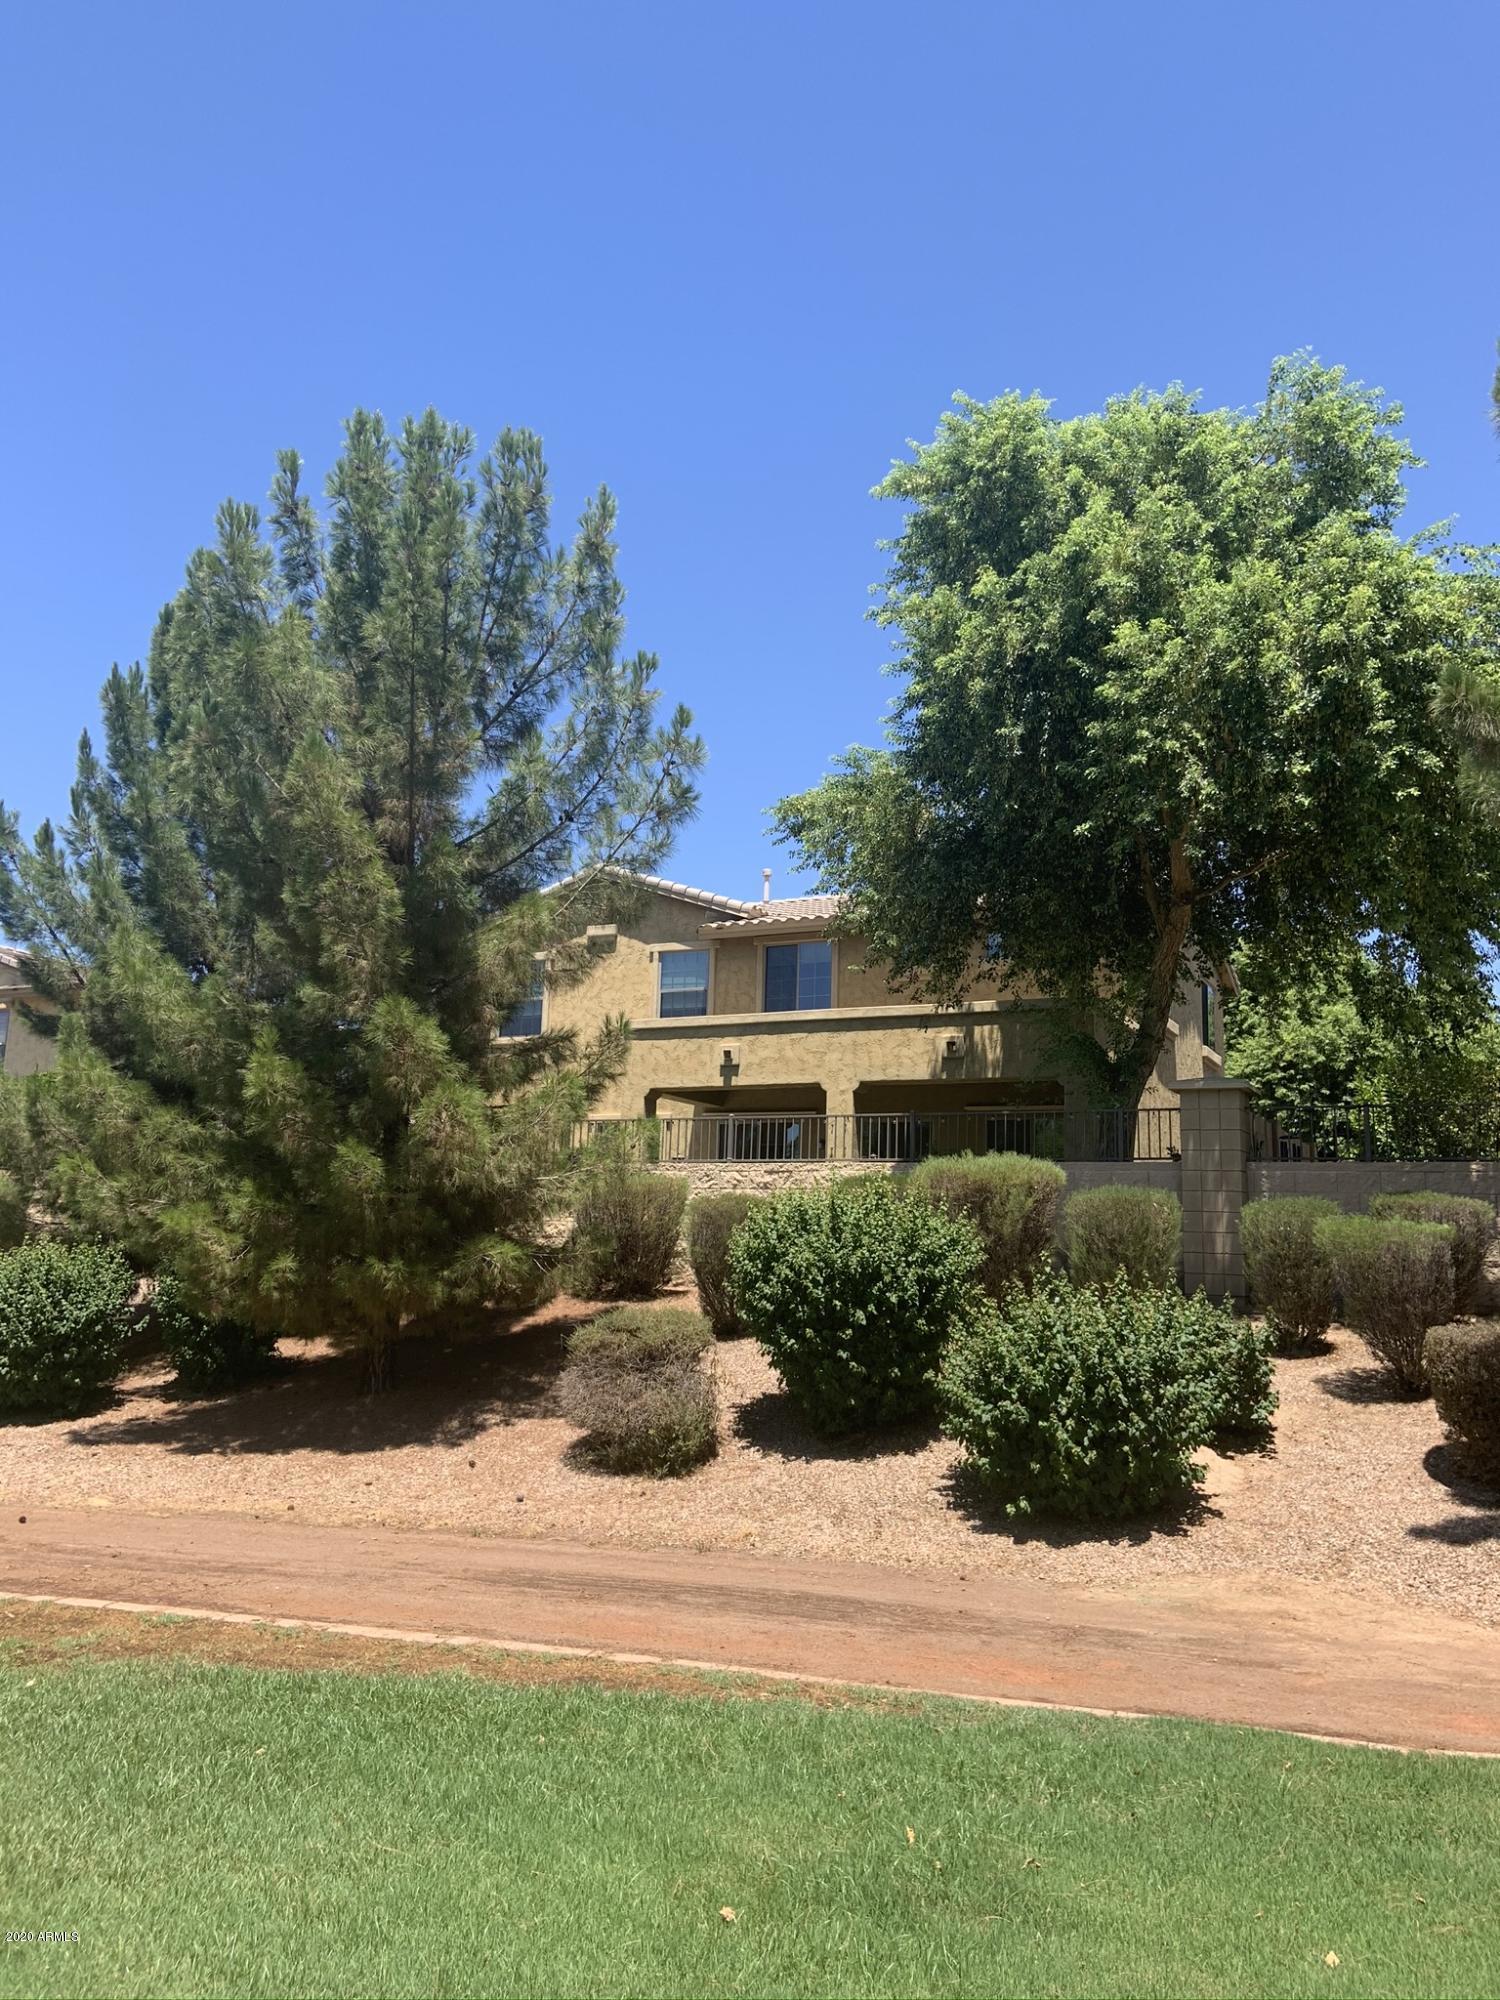 MLS 6122131 1029 E LODGEPOLE Drive, Gilbert, AZ 85298 Felty Farms